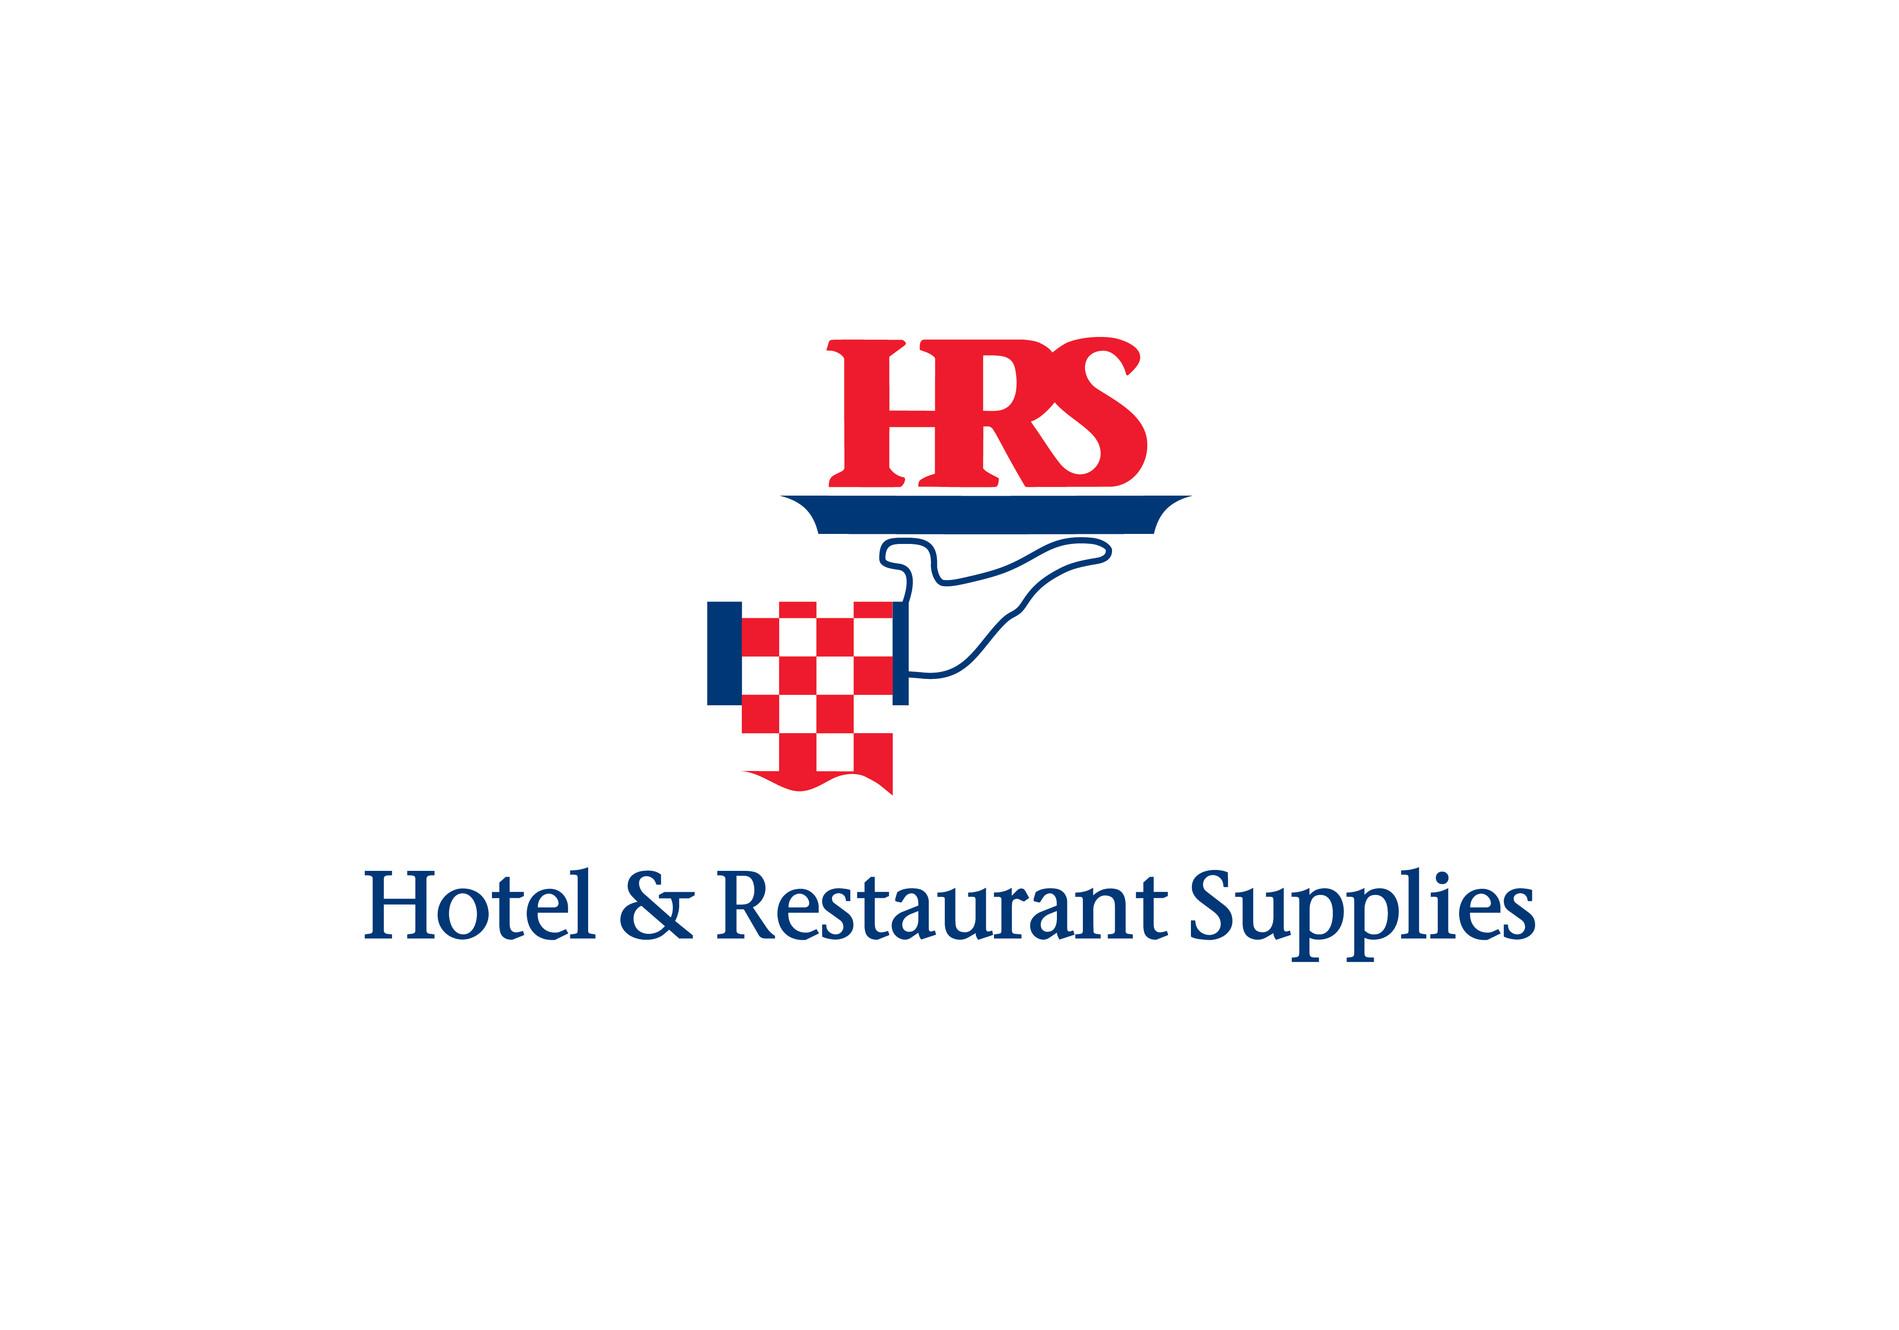 Hotel & Restaurant Supplies | Bahrain | HRS